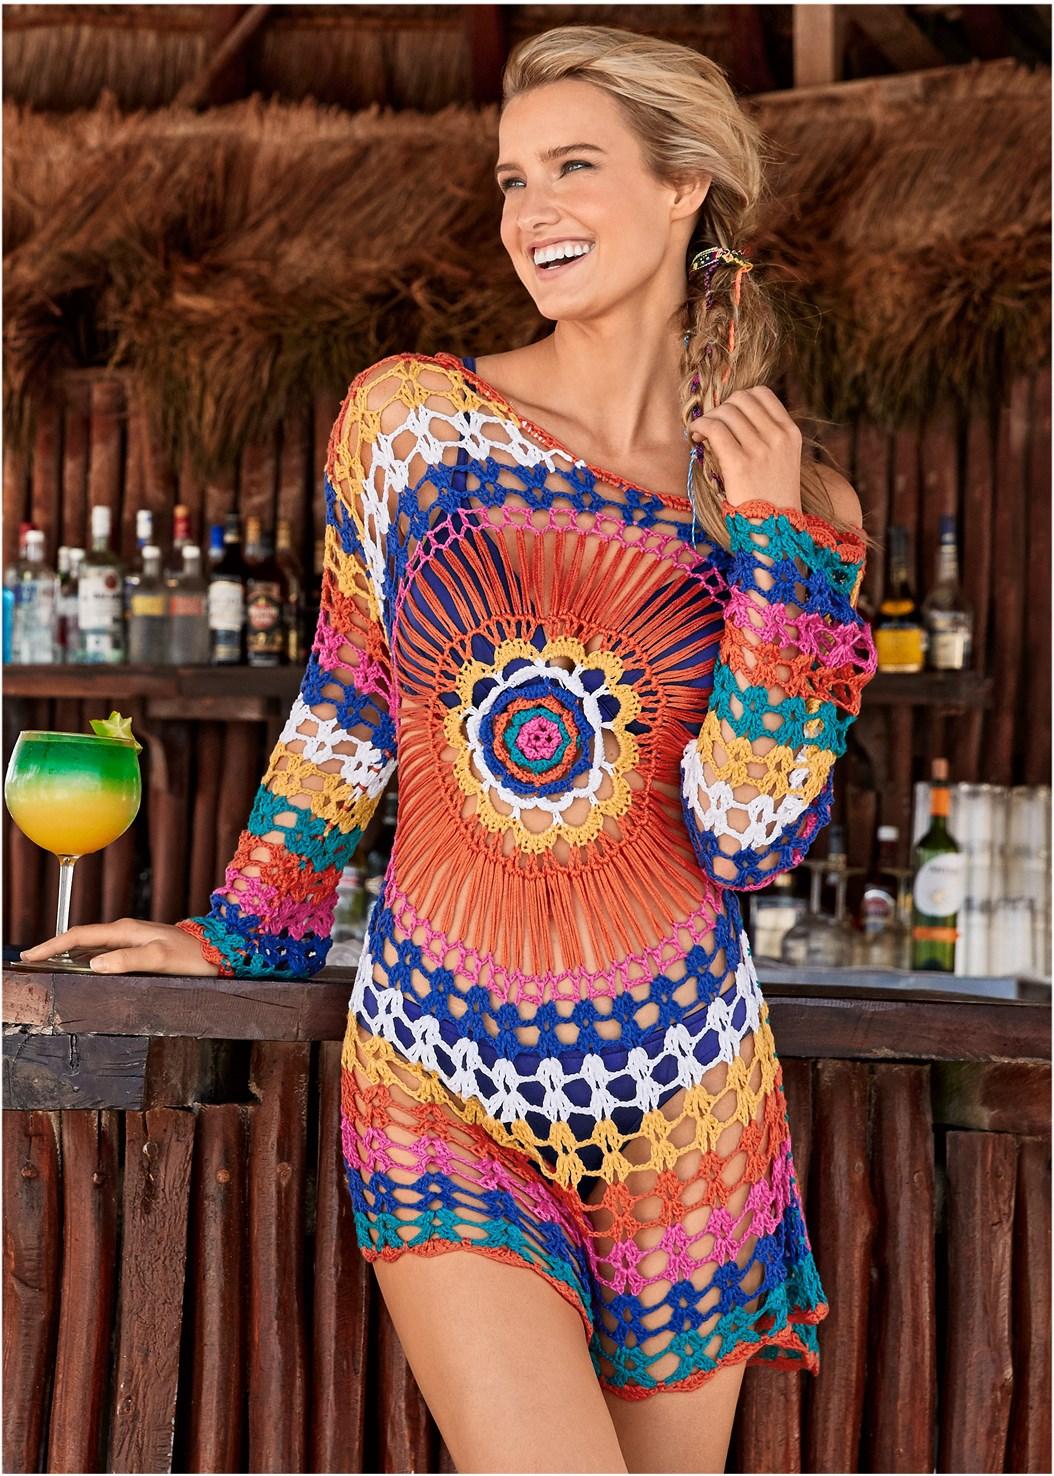 Crochet Detail Cover-Up,Underwire Ring Top,Triangle String Bikini Top,Scoop Front Bikini Bottom